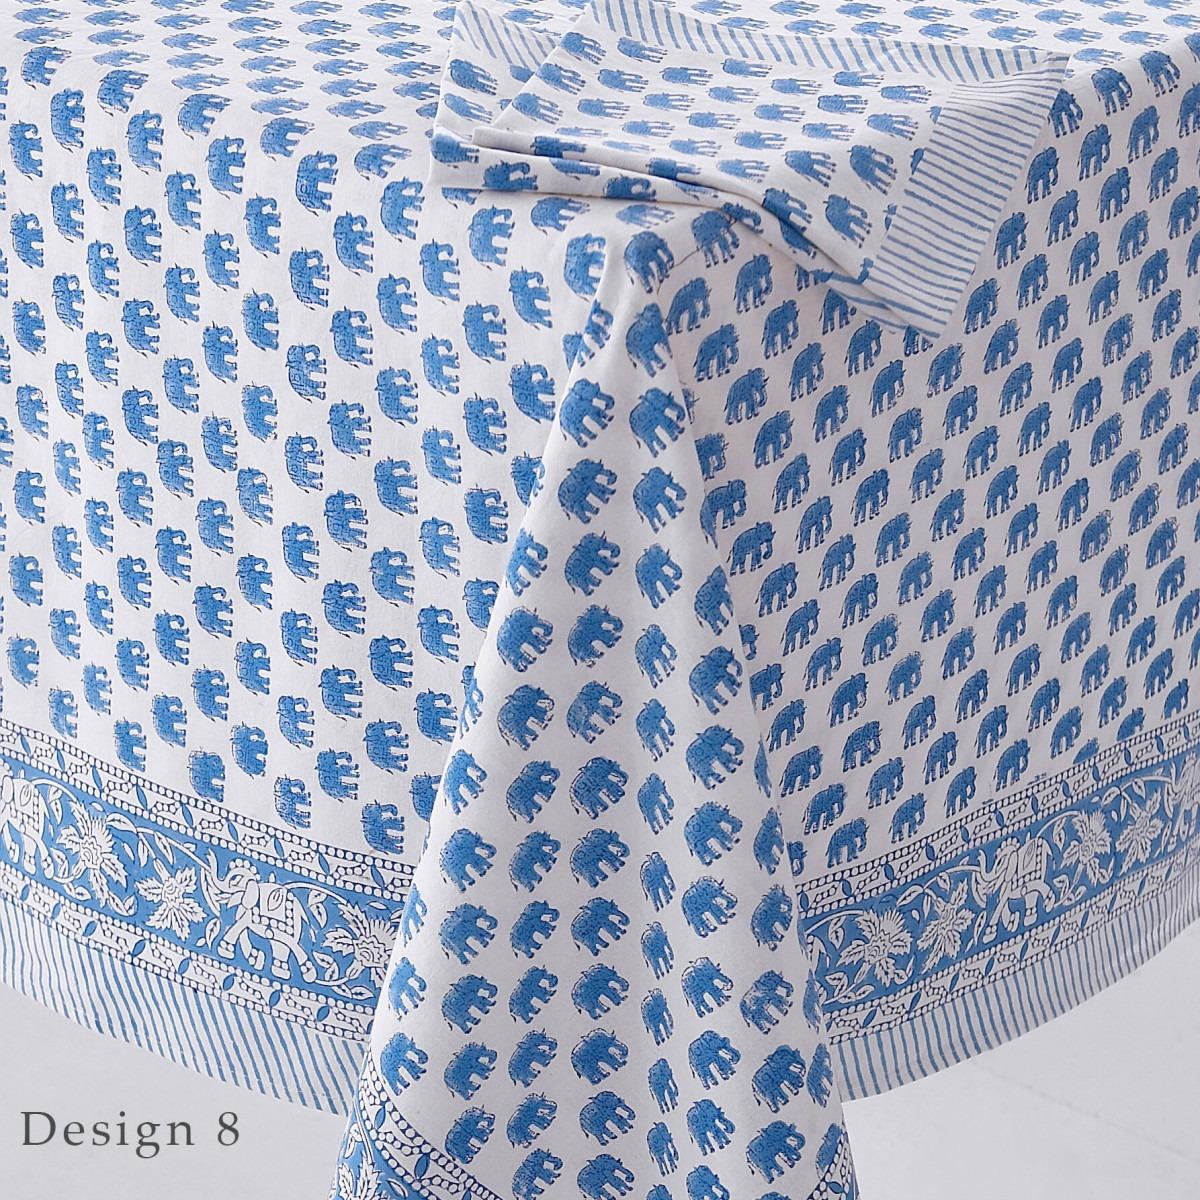 Block Printed Tablecloth Design 8